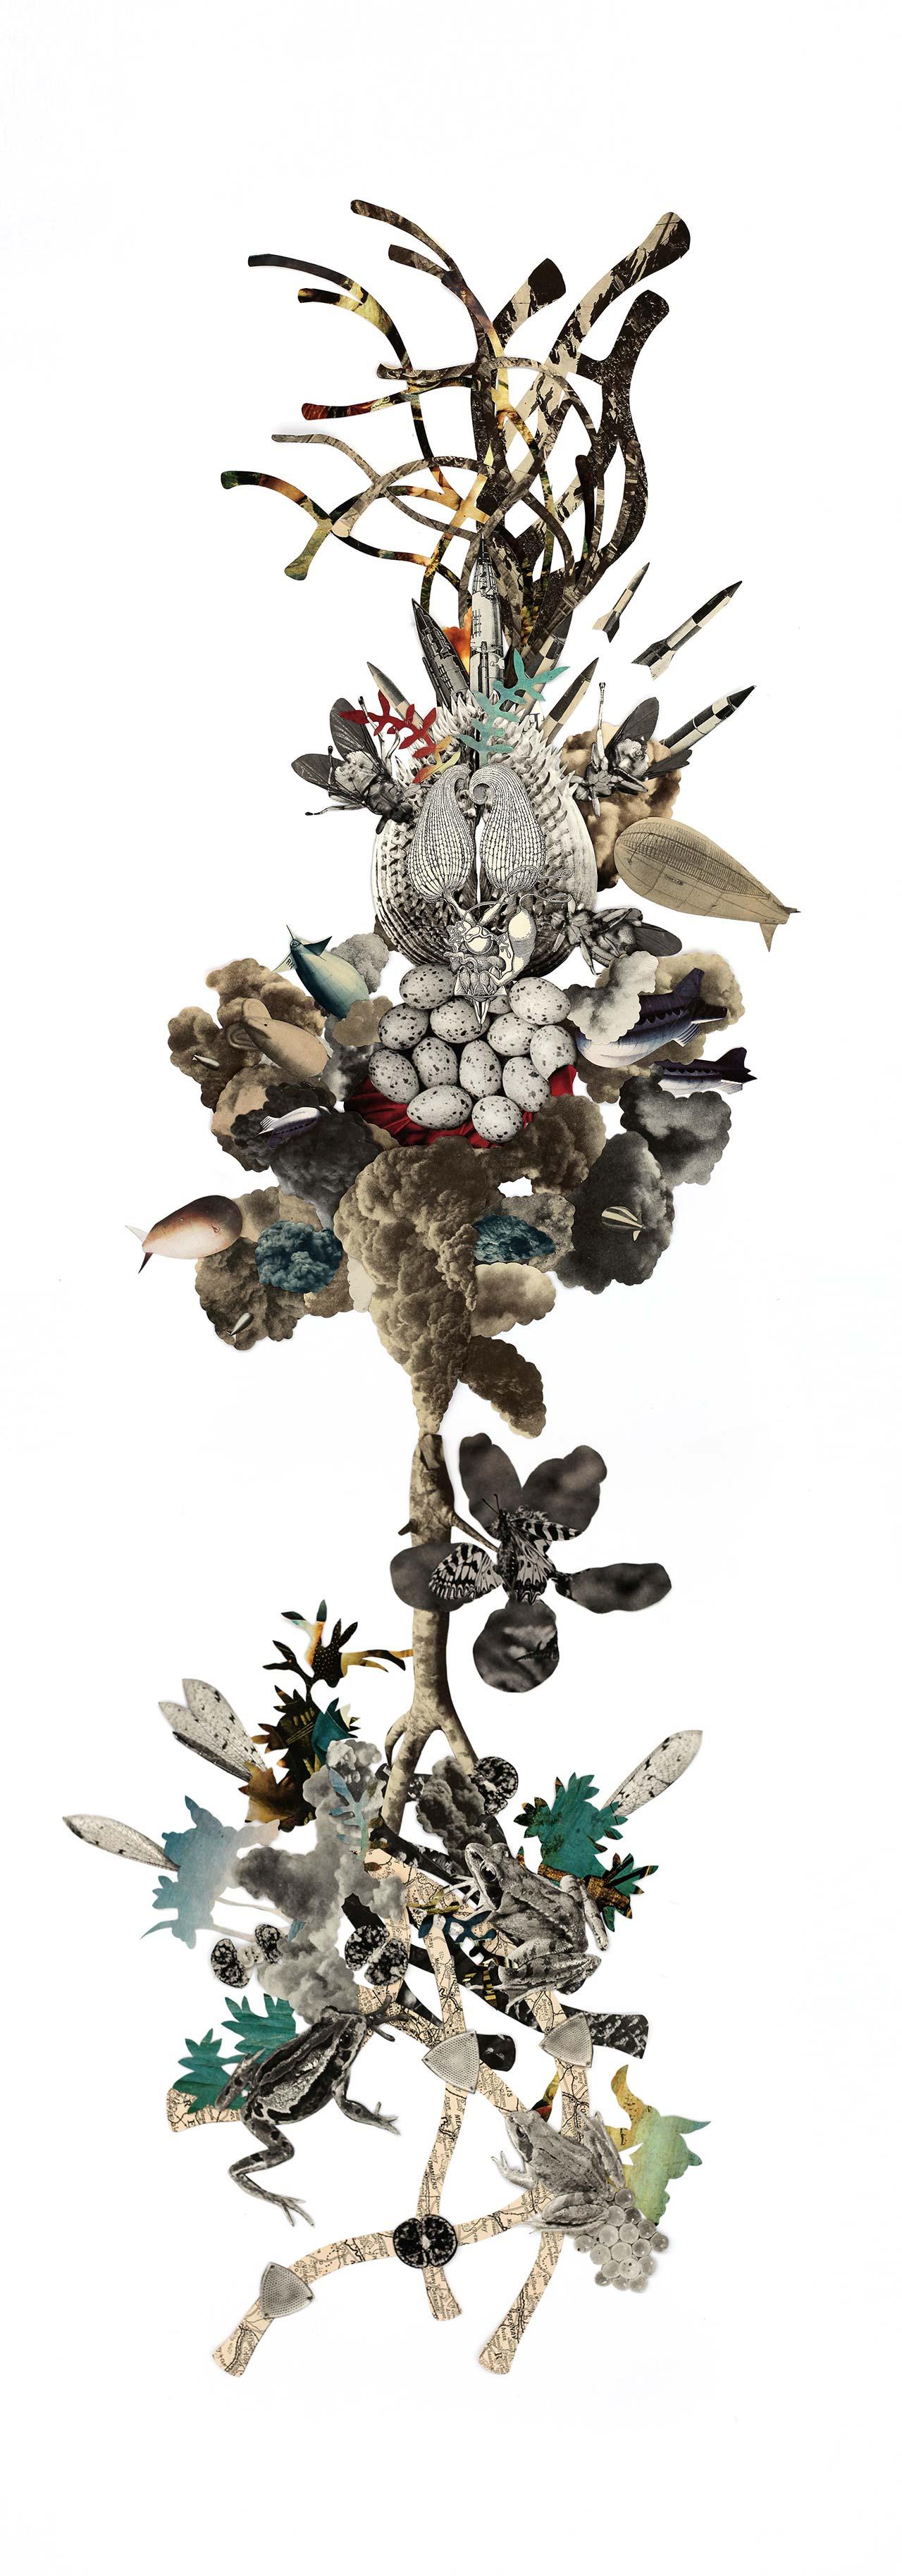 Barbara Wildenboer,Totem I, from 'Towers of Babel' series.©Barbara Wildenboer.